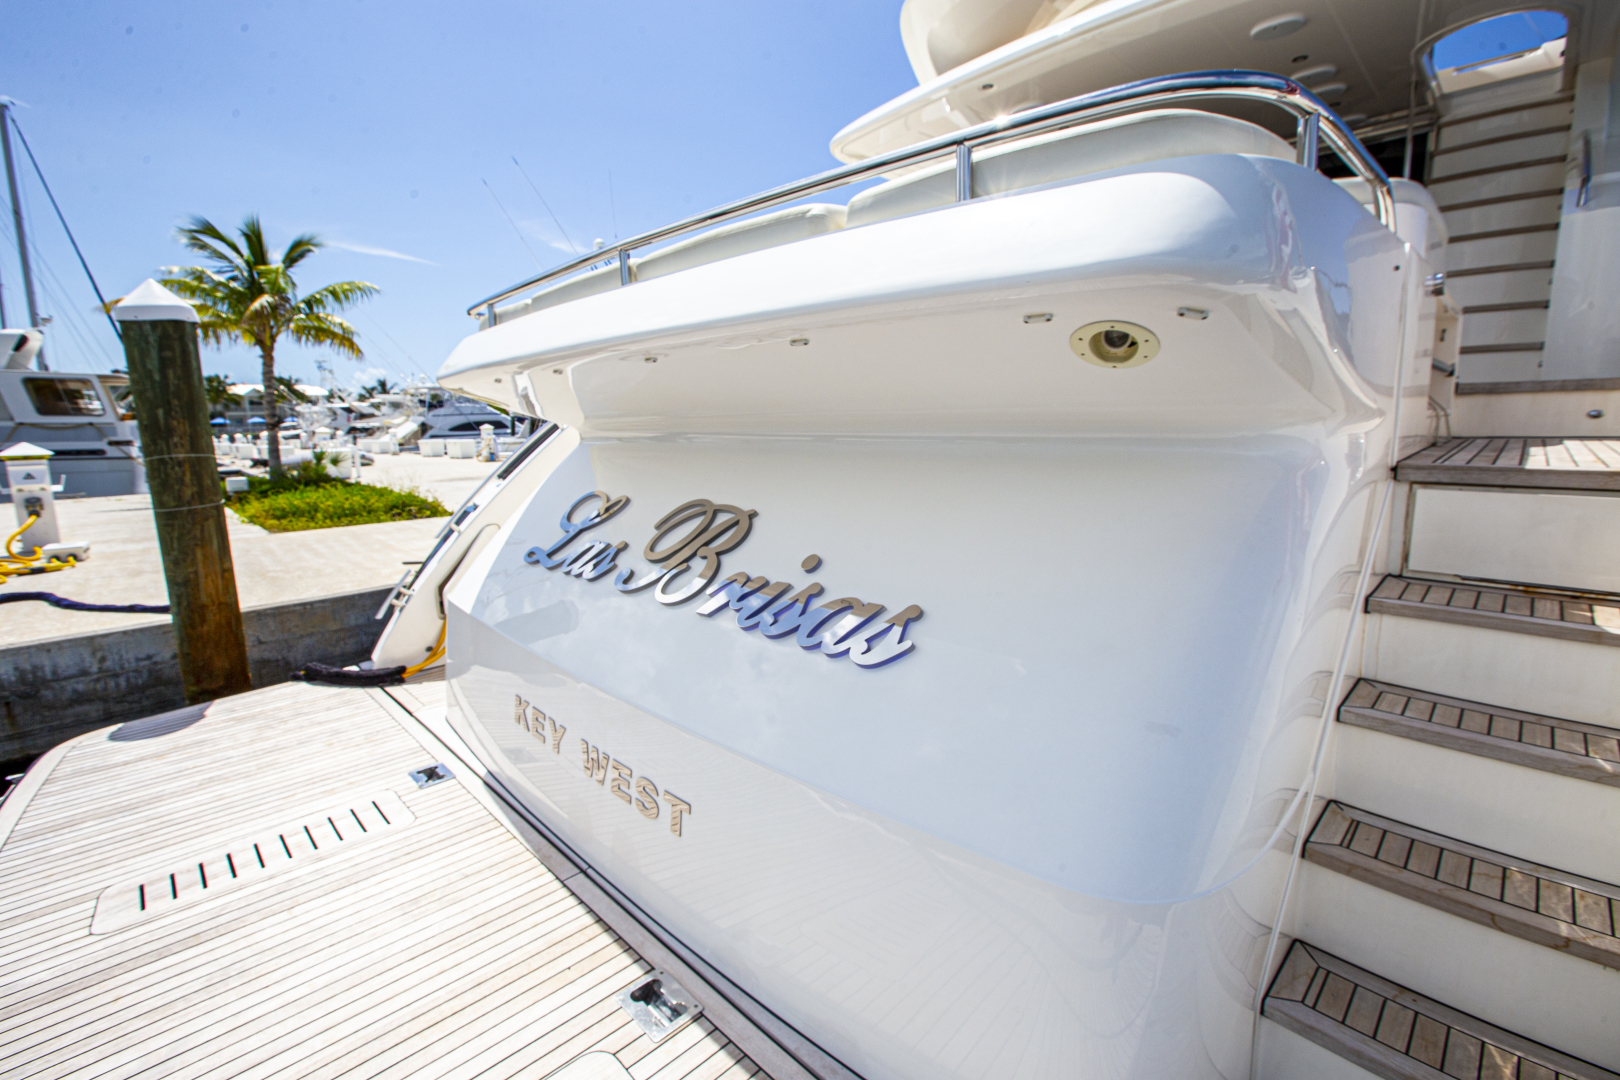 Viking Princess-V85 2009-Las Brisas Fort Lauderdale-Florida-United States-1365548 | Thumbnail